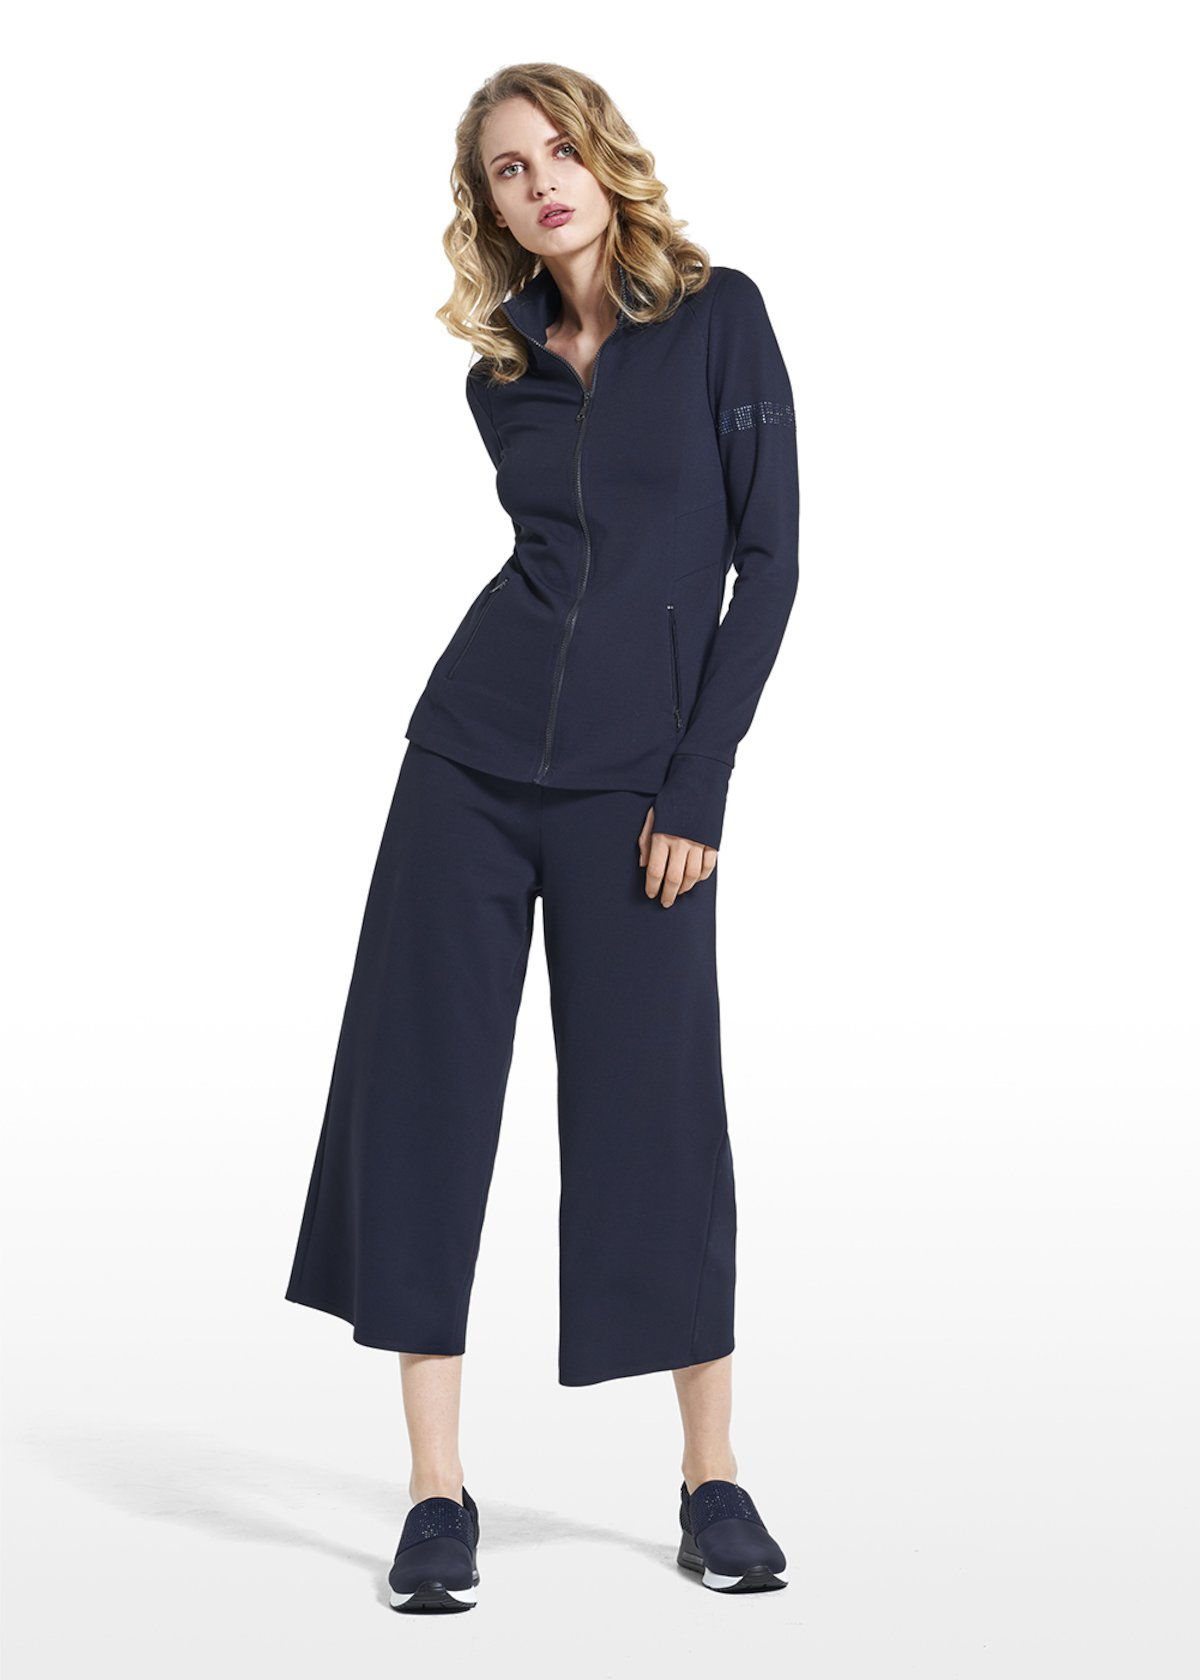 Sweatshirt Fiona in Punto Milano fabric